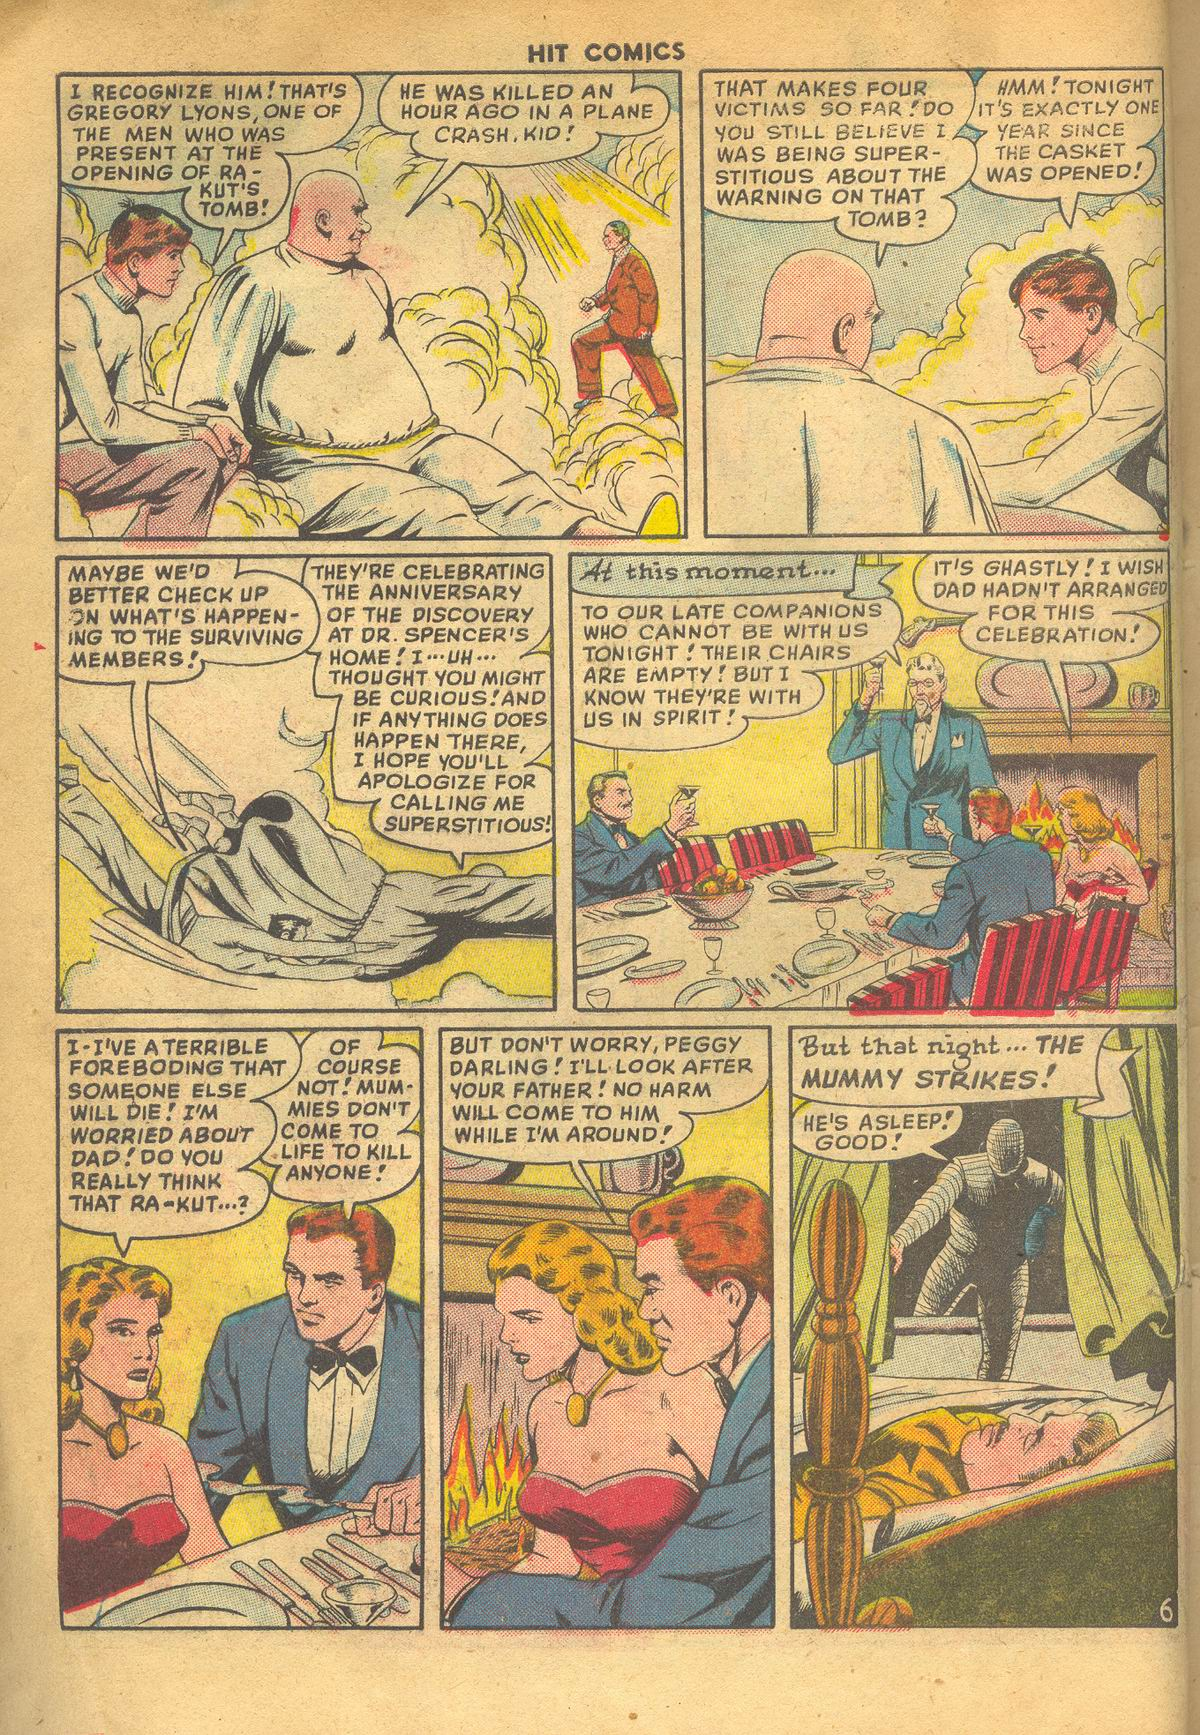 Read online Hit Comics comic -  Issue #60 - 8